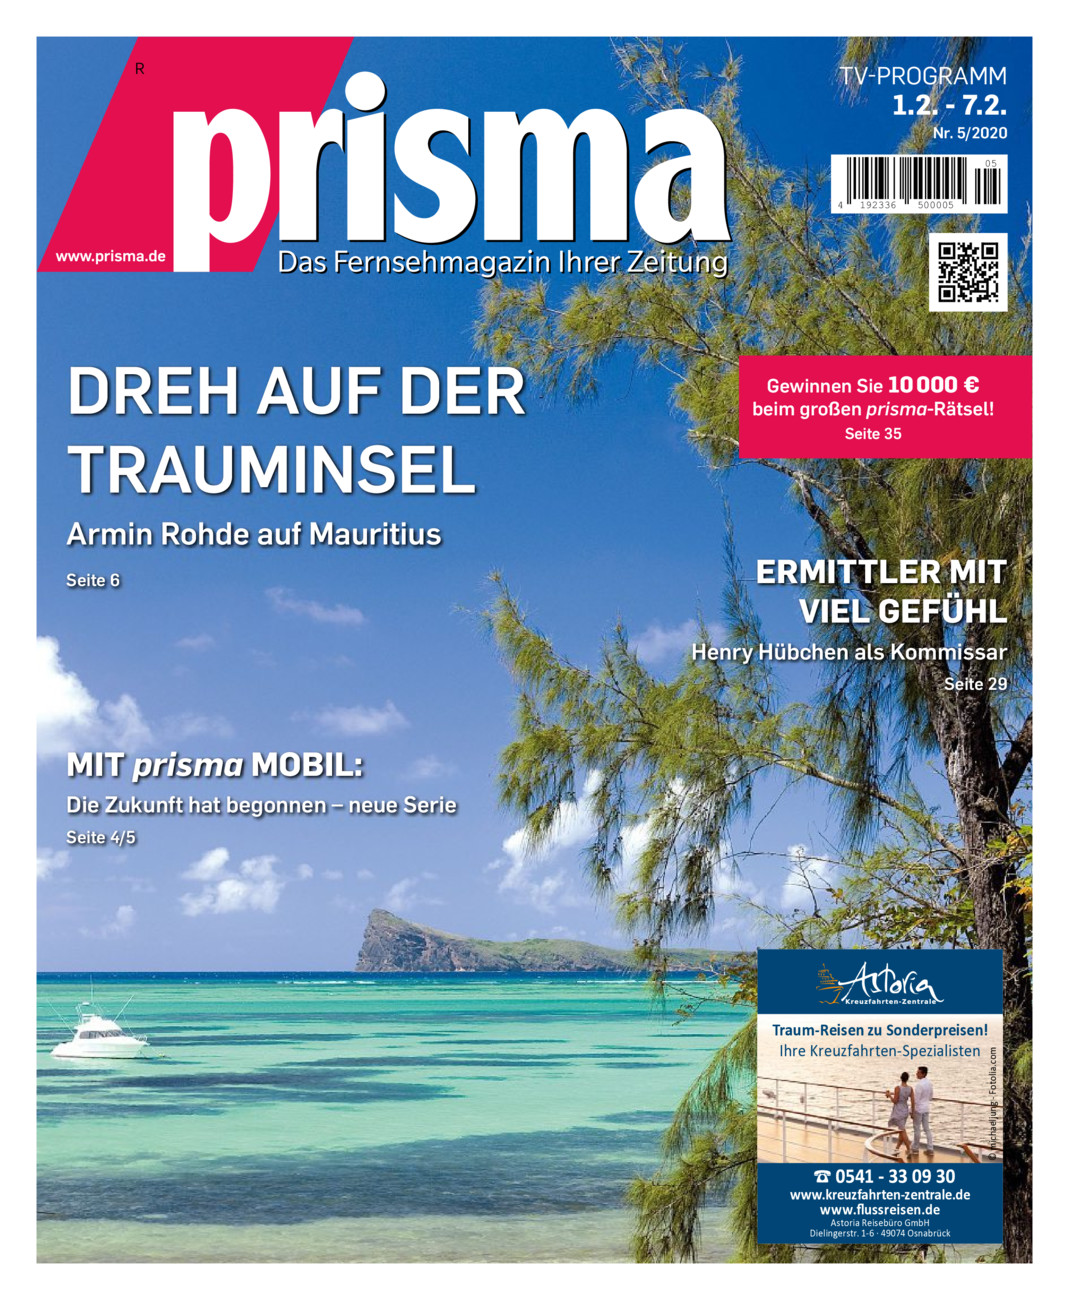 Prisma 1. - 7.2